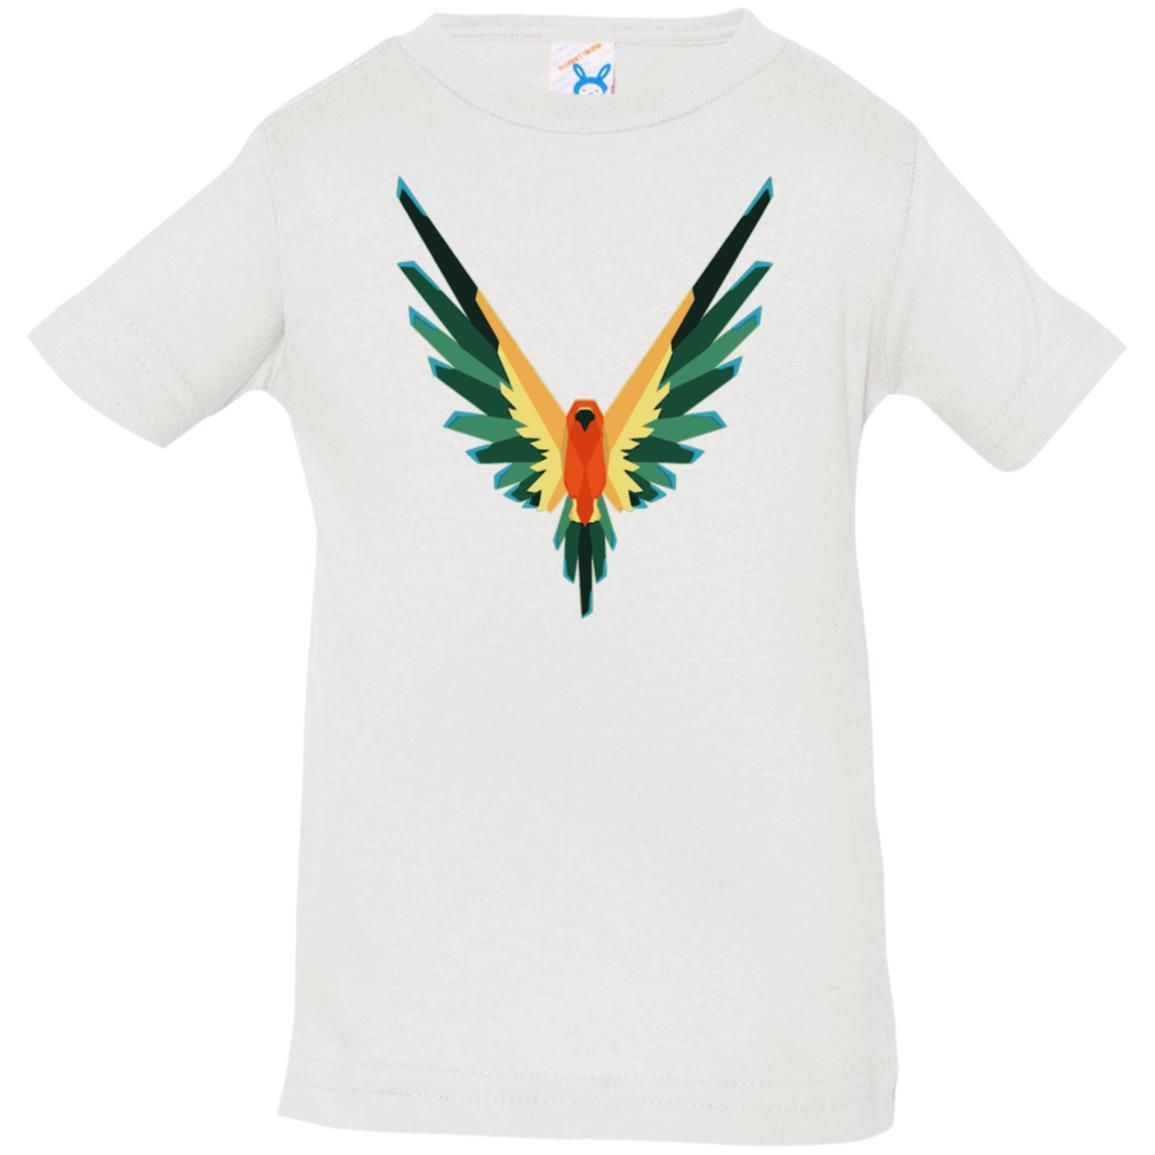 image 1240 - Logan Paul Maverick kid shirt & sweatshirt